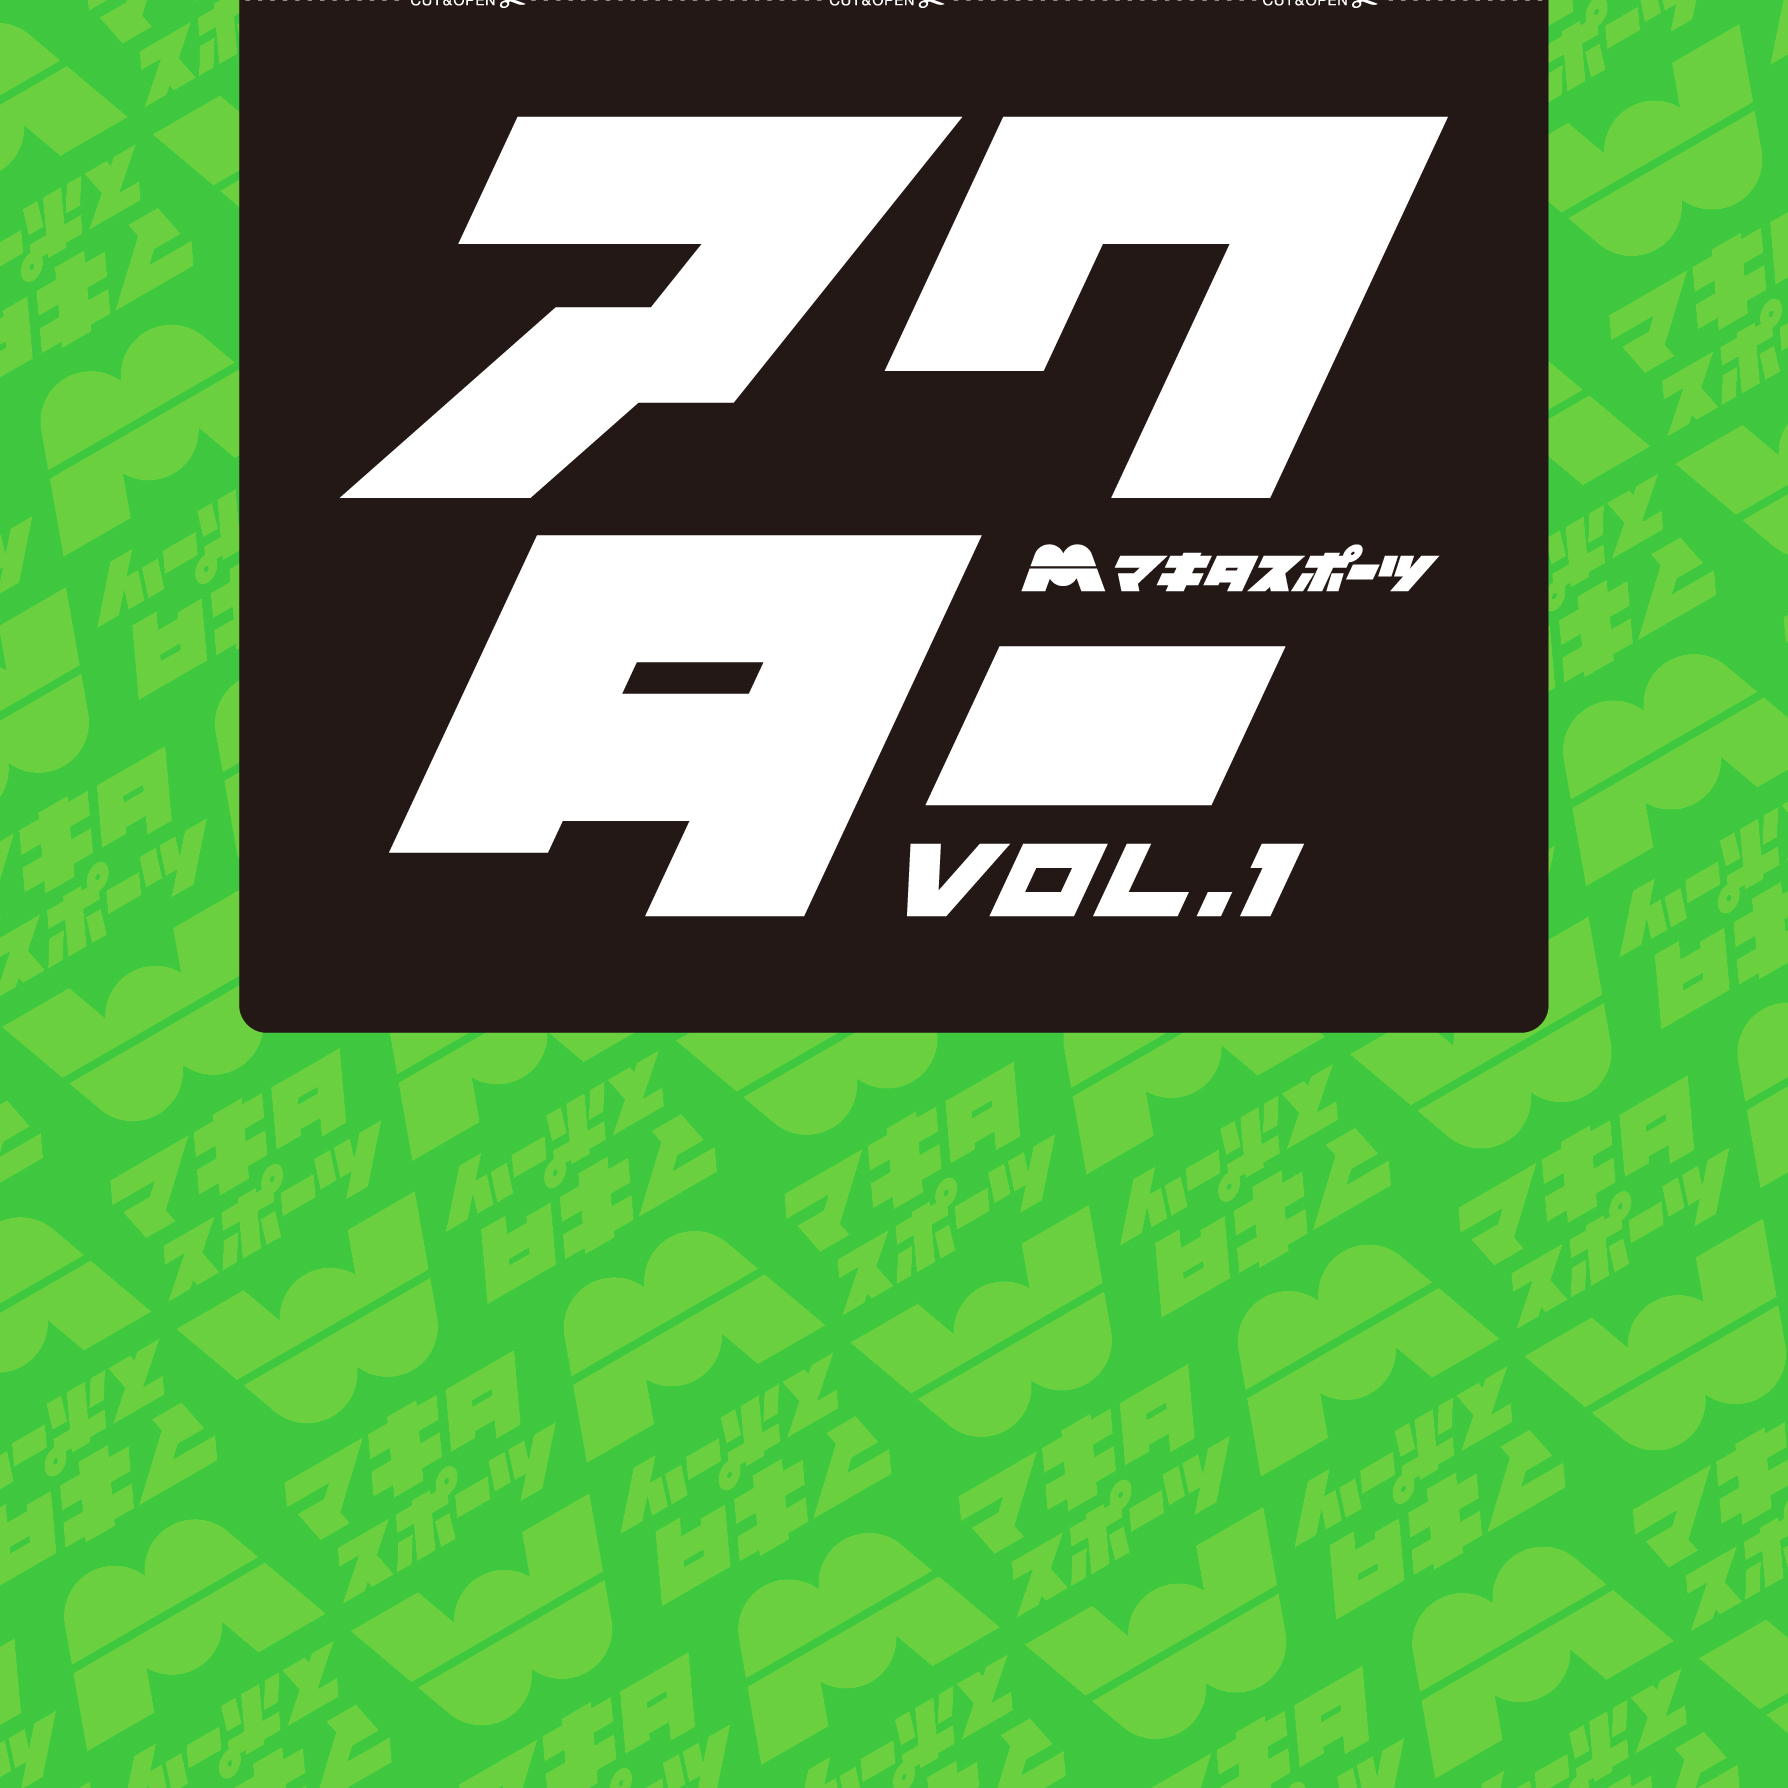 LIVE会場限定販売CD「アクターVol.1」